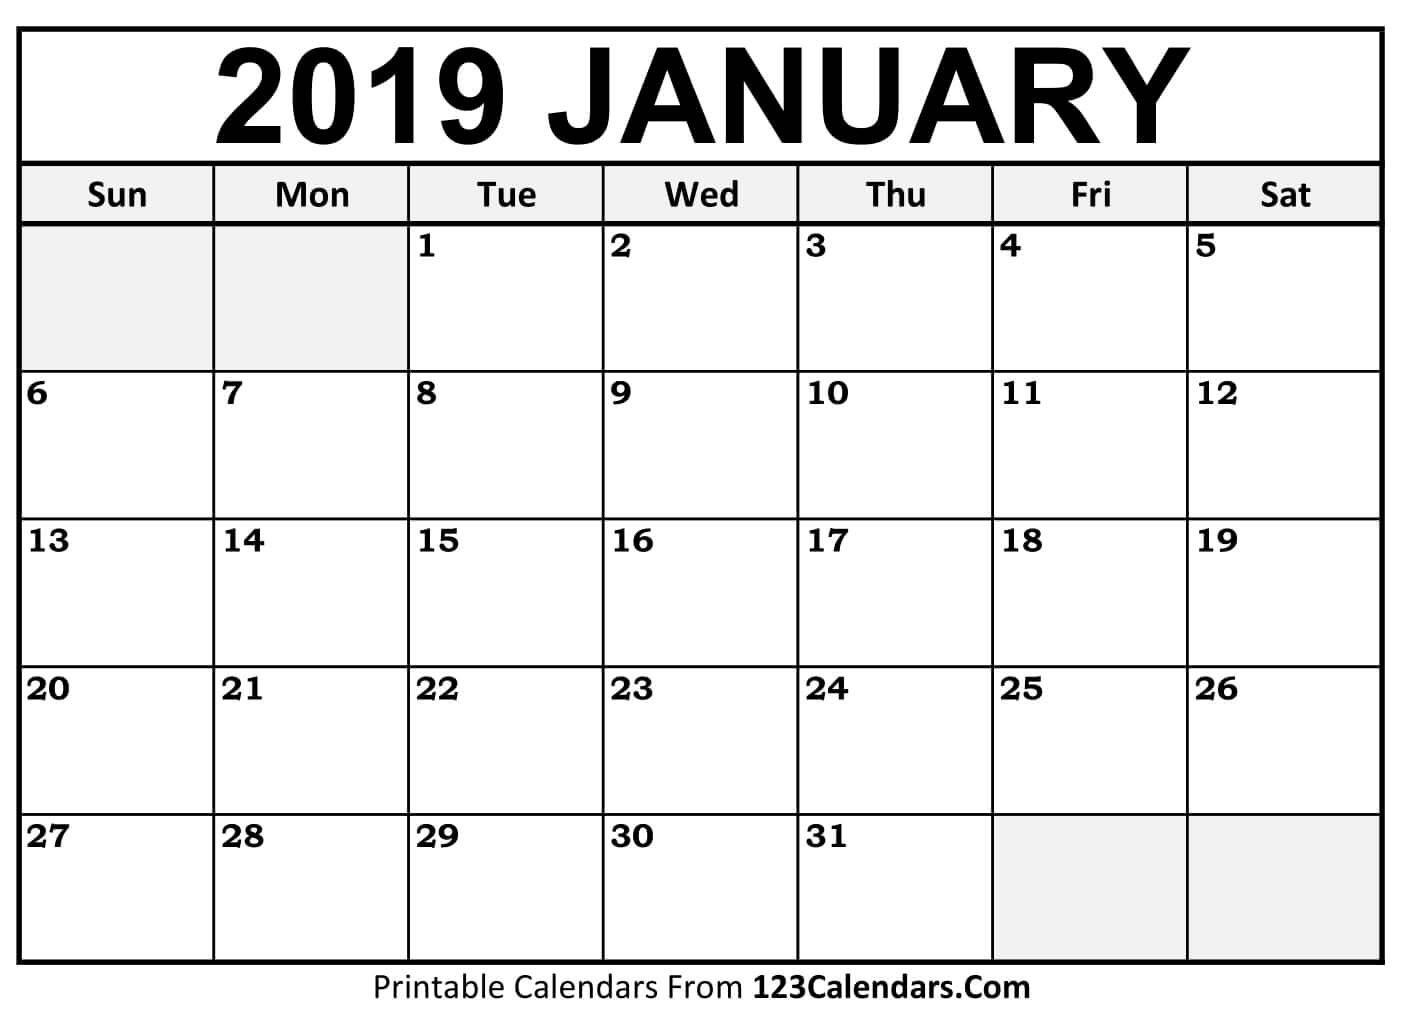 January 2019 Calendar Printable – Printable Calendar 2019| Blank Calendar 2019 Printable January